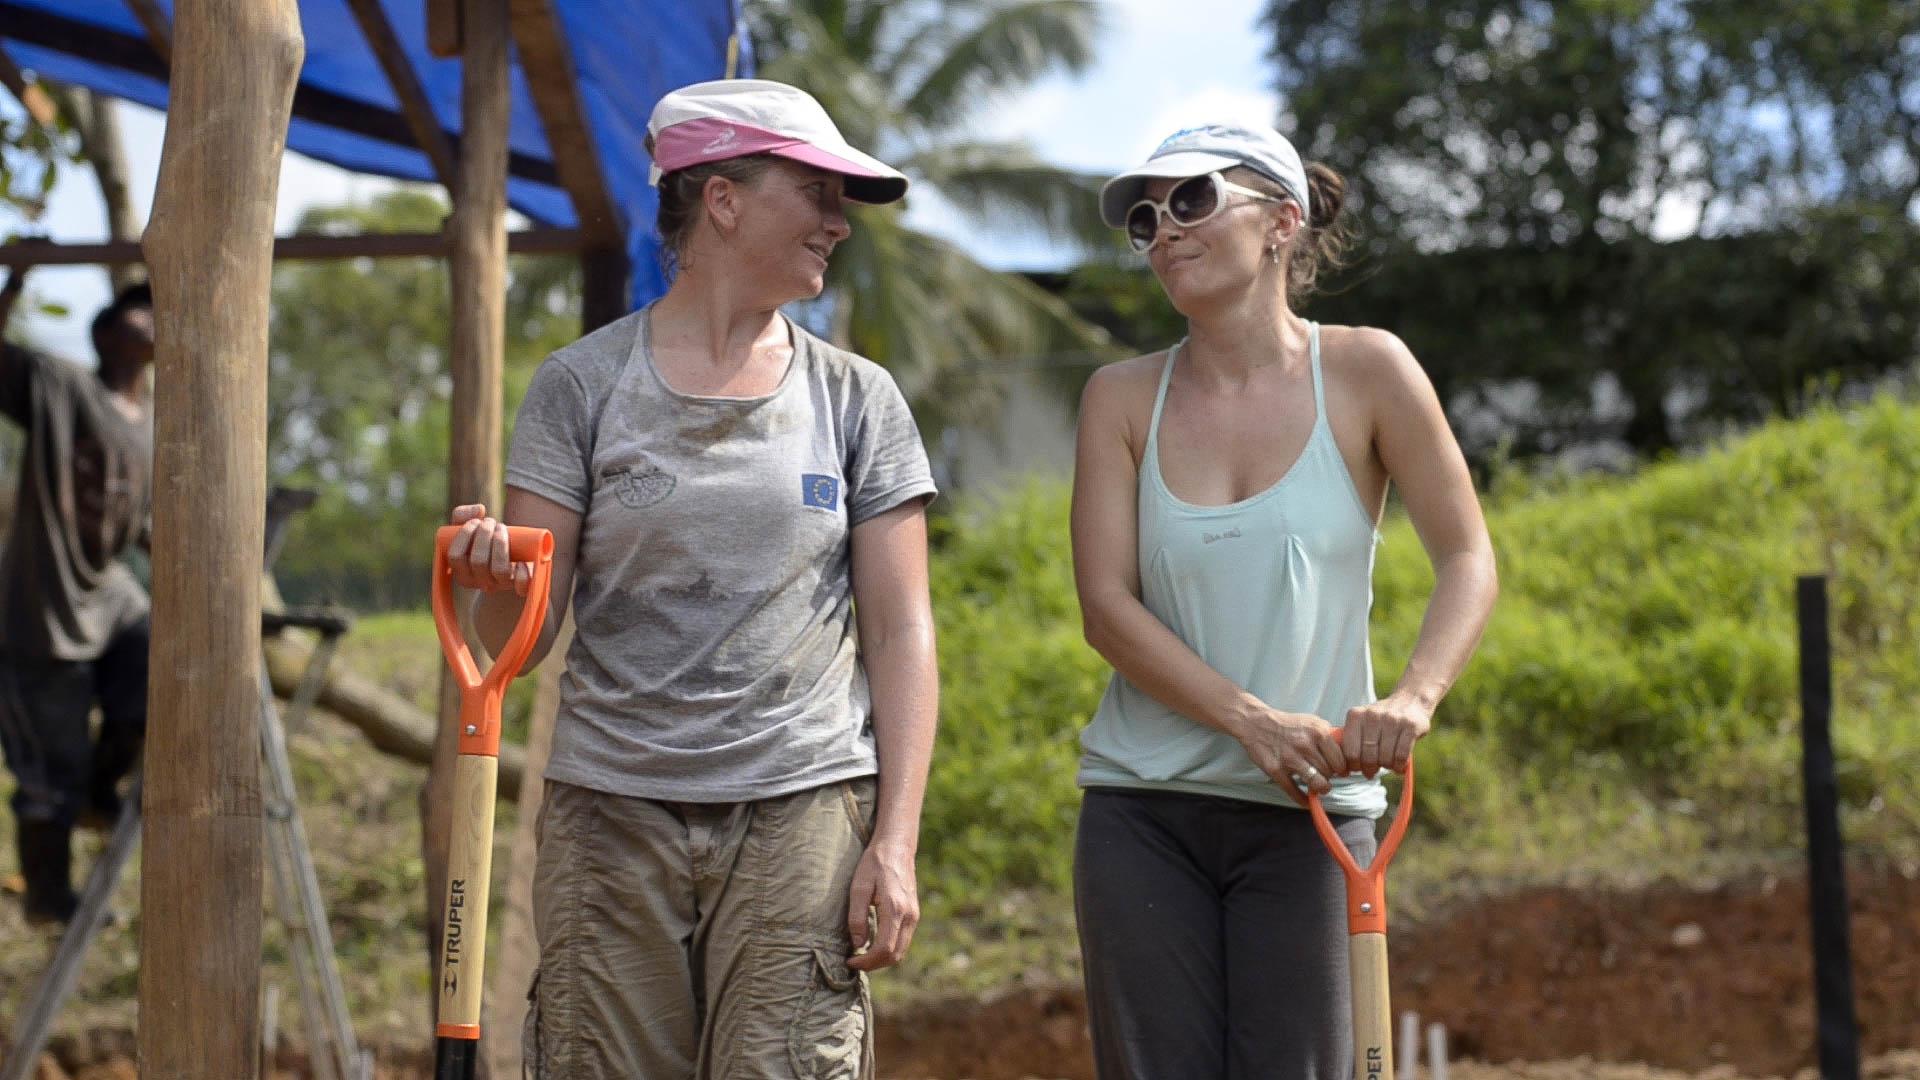 Nuin-Tara and Martina, digging at Verbo - sill, Tom Miller